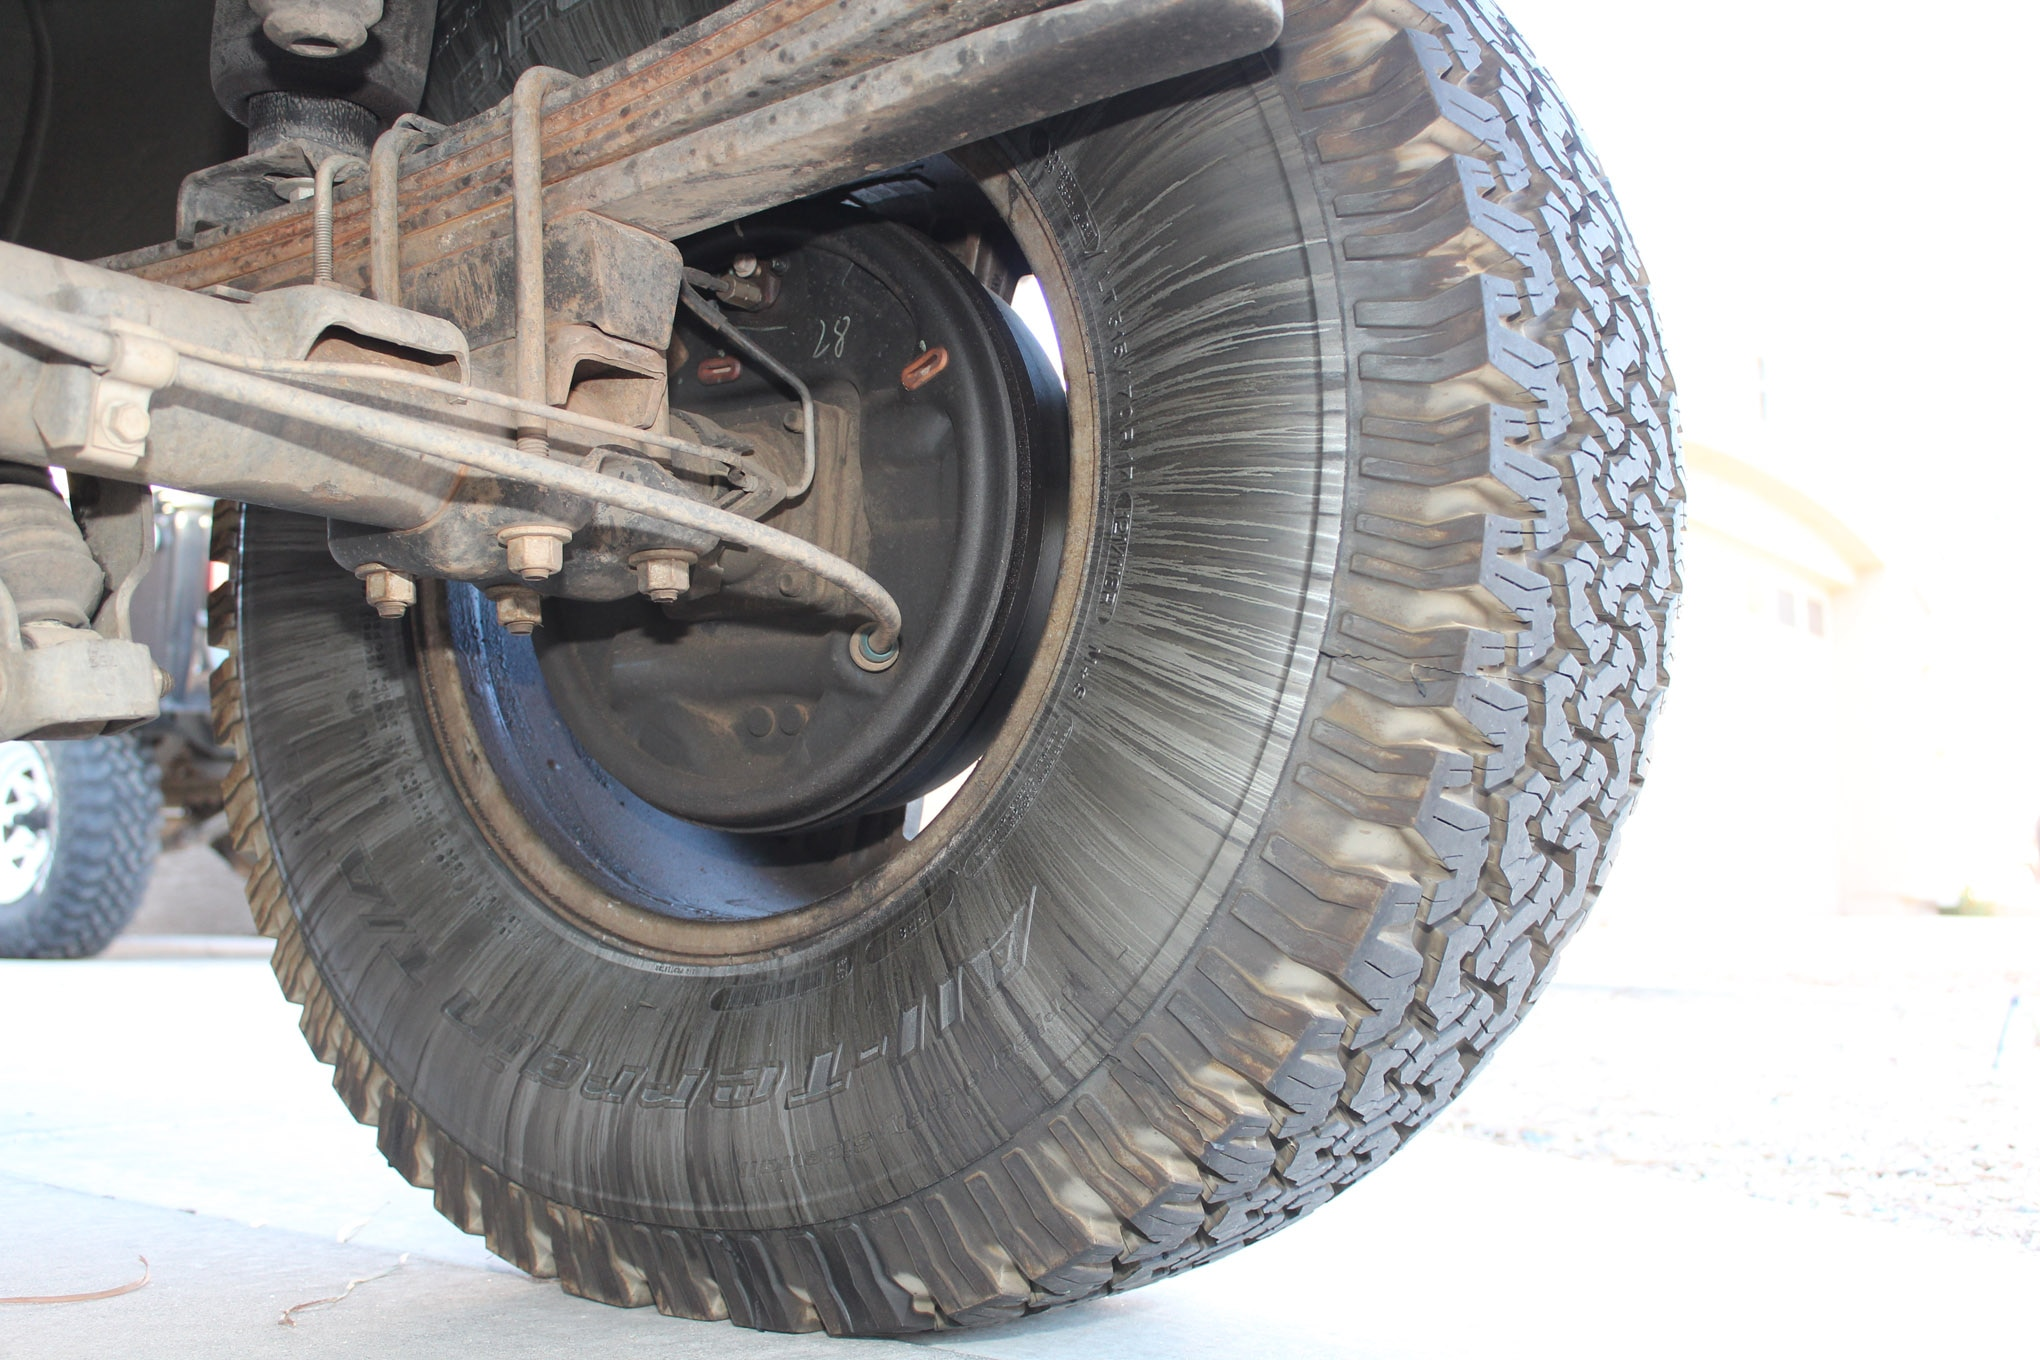 05 nuts failed wheel seal